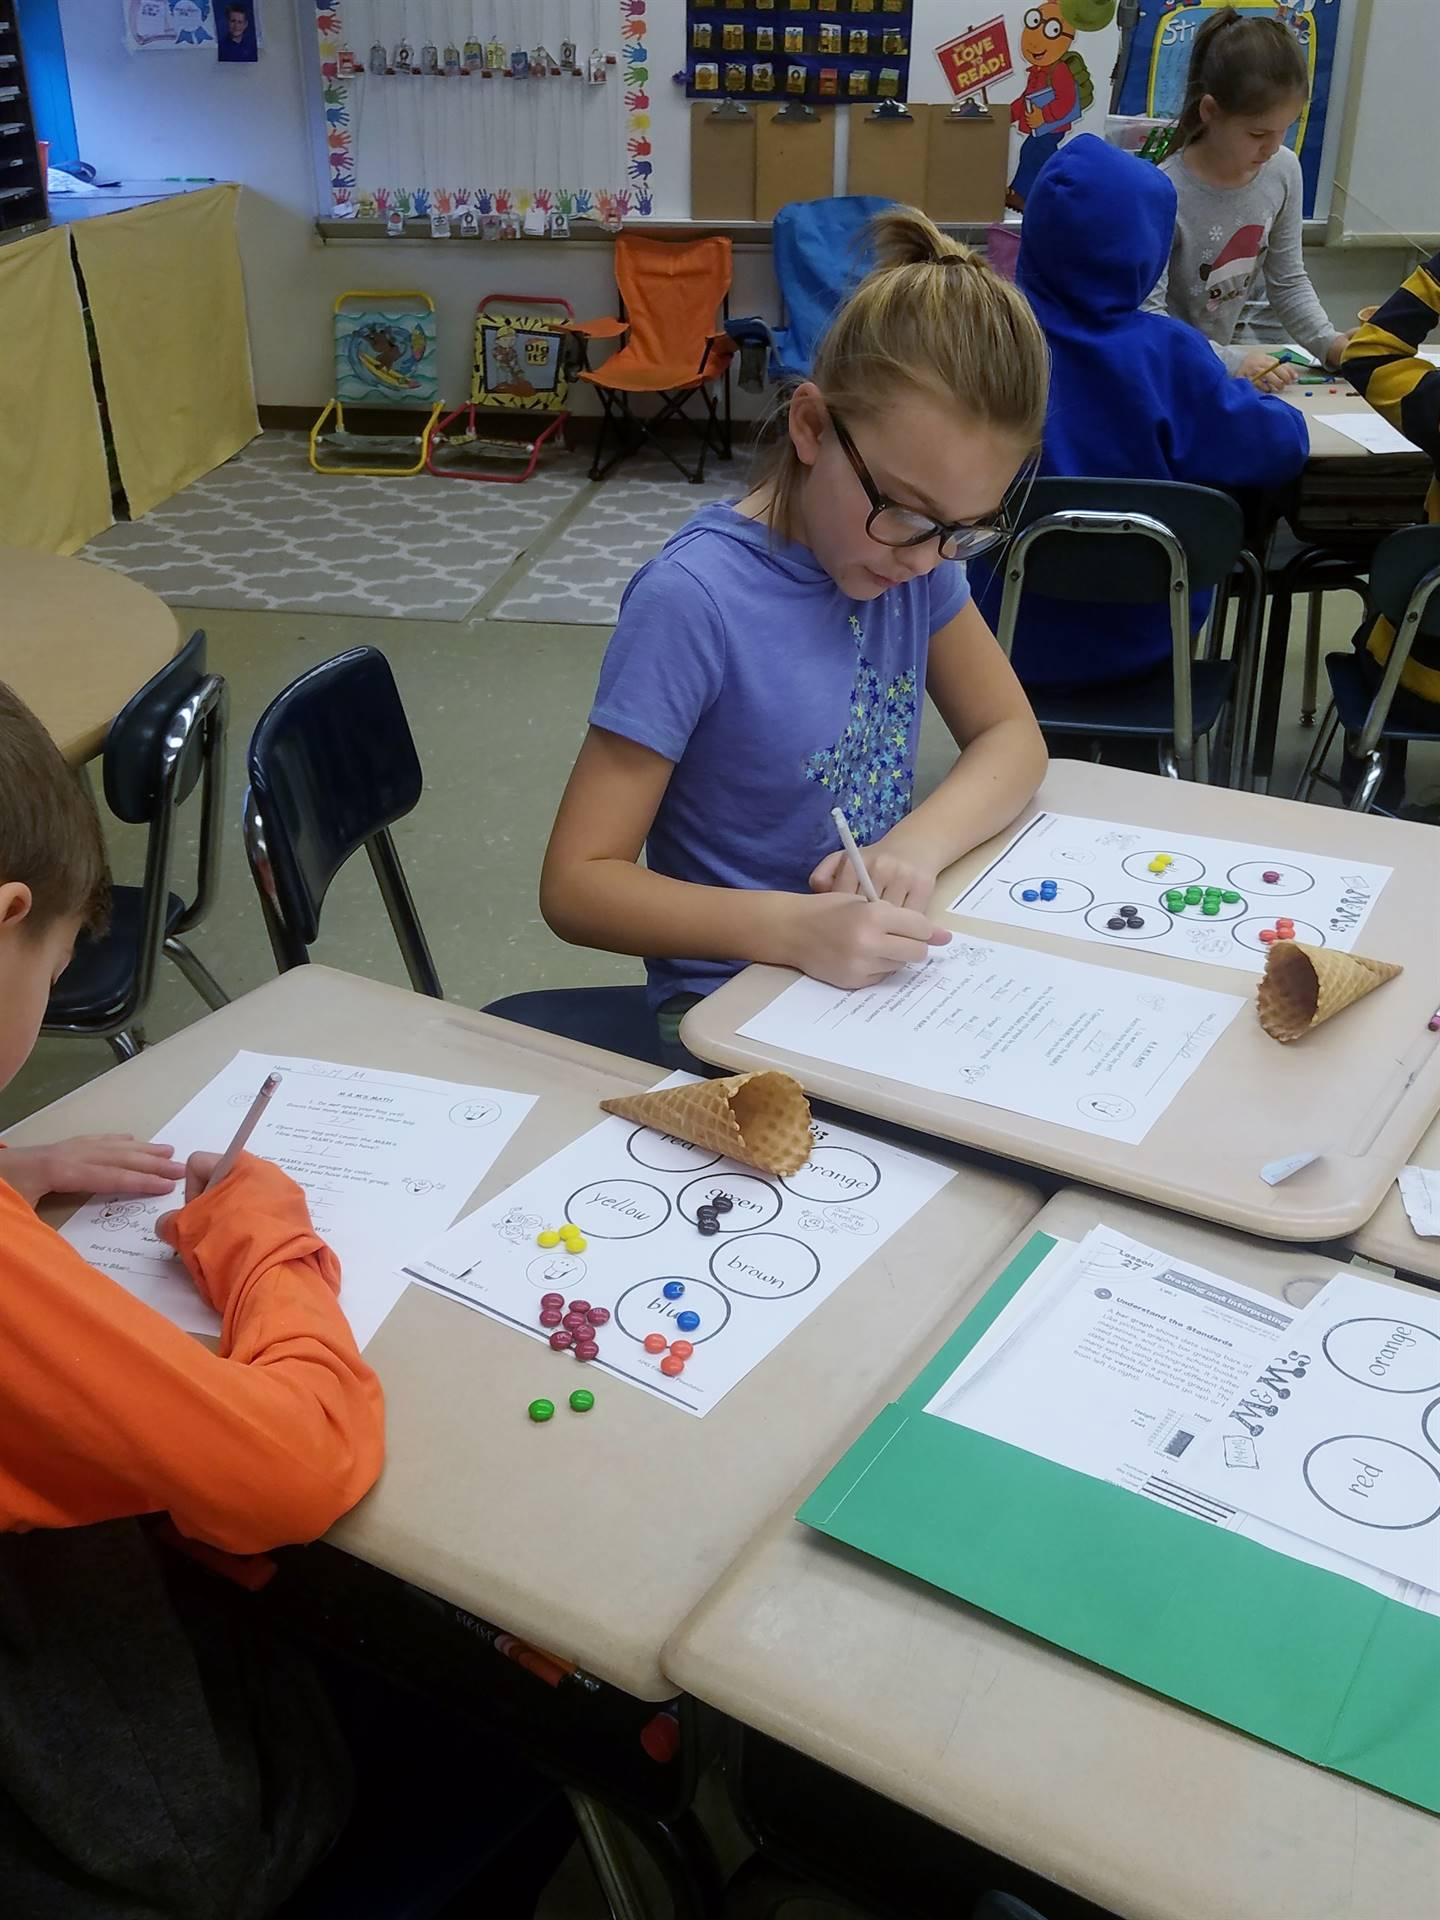 Ms.-Dugan's-3B-class-learns-math-using-M-&-M-candies